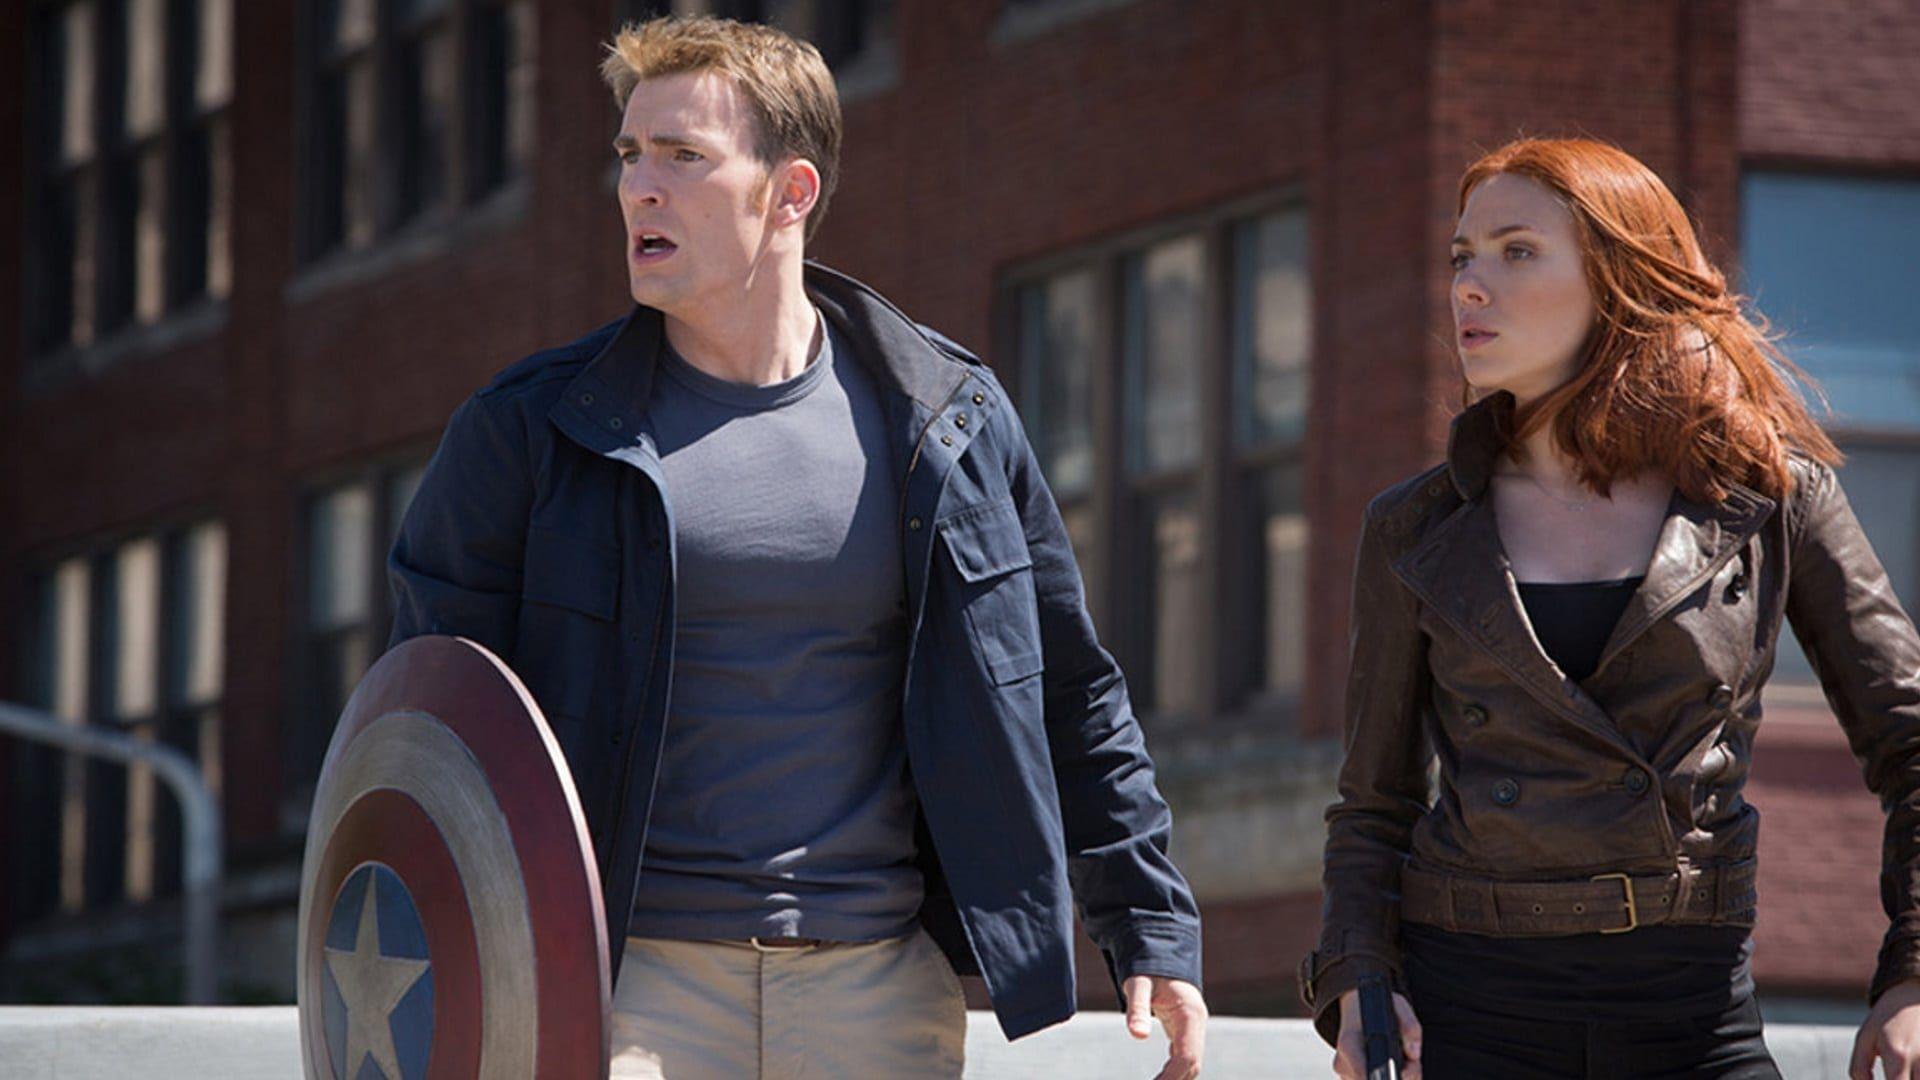 Amerika Kapitany A Tel Katonaja 2014 Online Teljes Film Filmek Magyarul Letoltes Hd Captain America Winter Soldier Captain America Captain America Winter